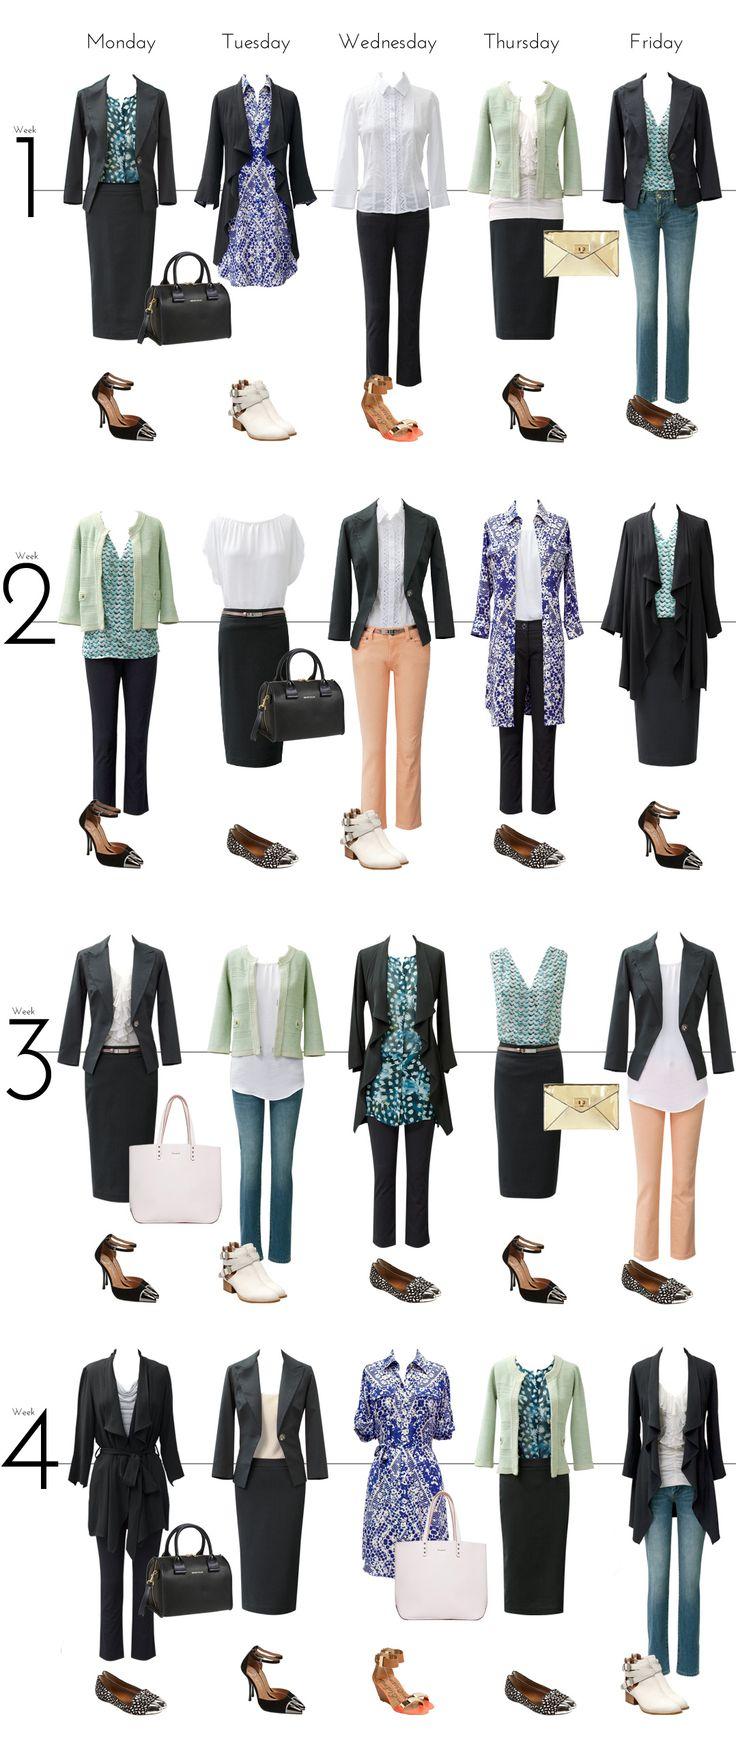 15 ITEMS: 1.CAbi Bossy Blazer 2.CAbi Jewel Shirt Dress 3